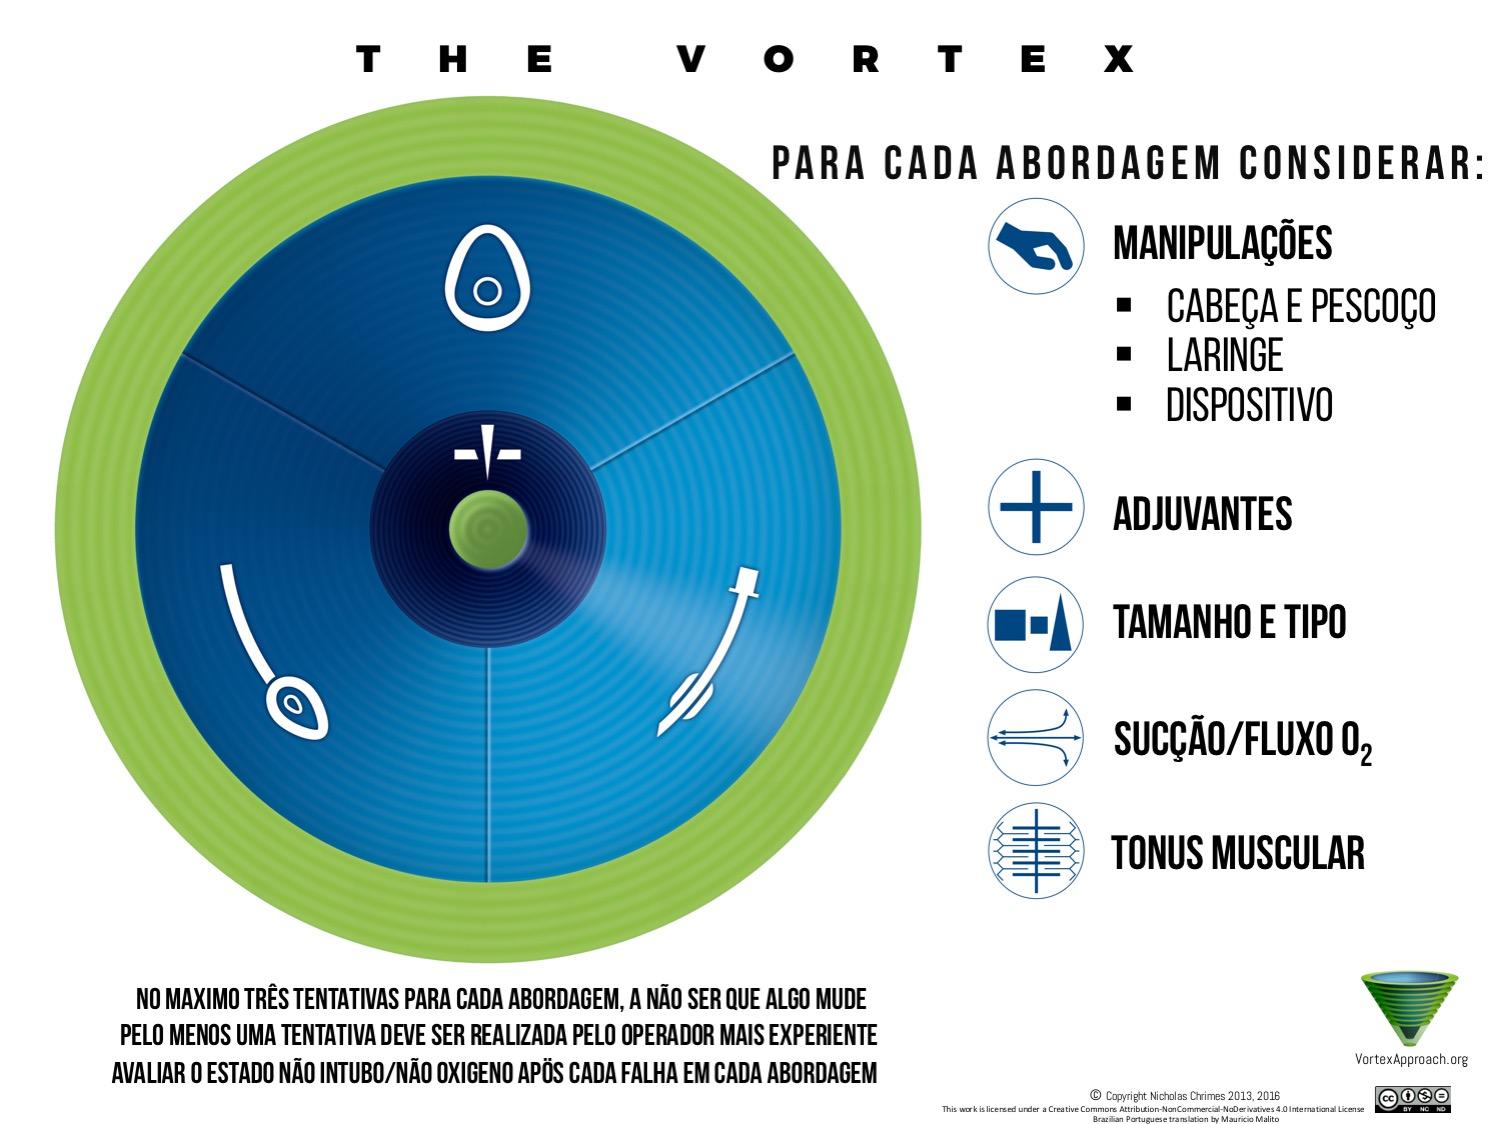 Vortex Implementation Tool - Brazilian Portuguese Version